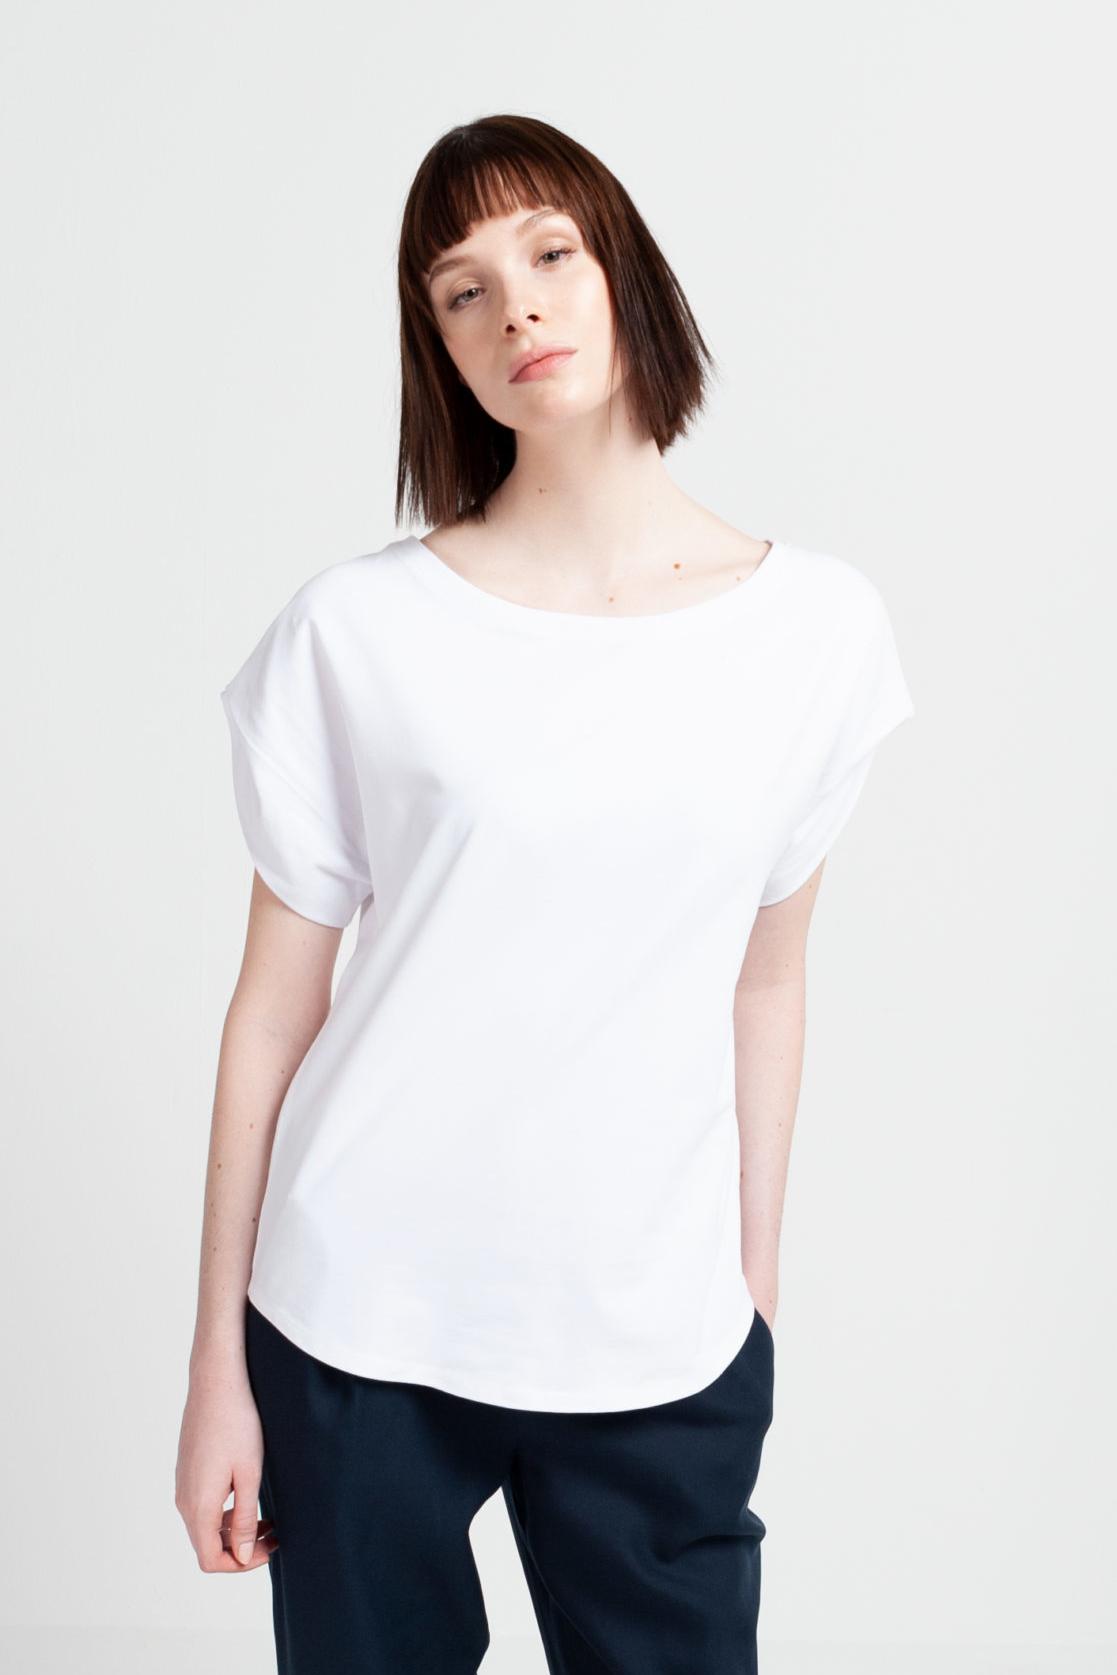 Roberta Organic Fashion Shipsheip Ellie T Shirt White (1)